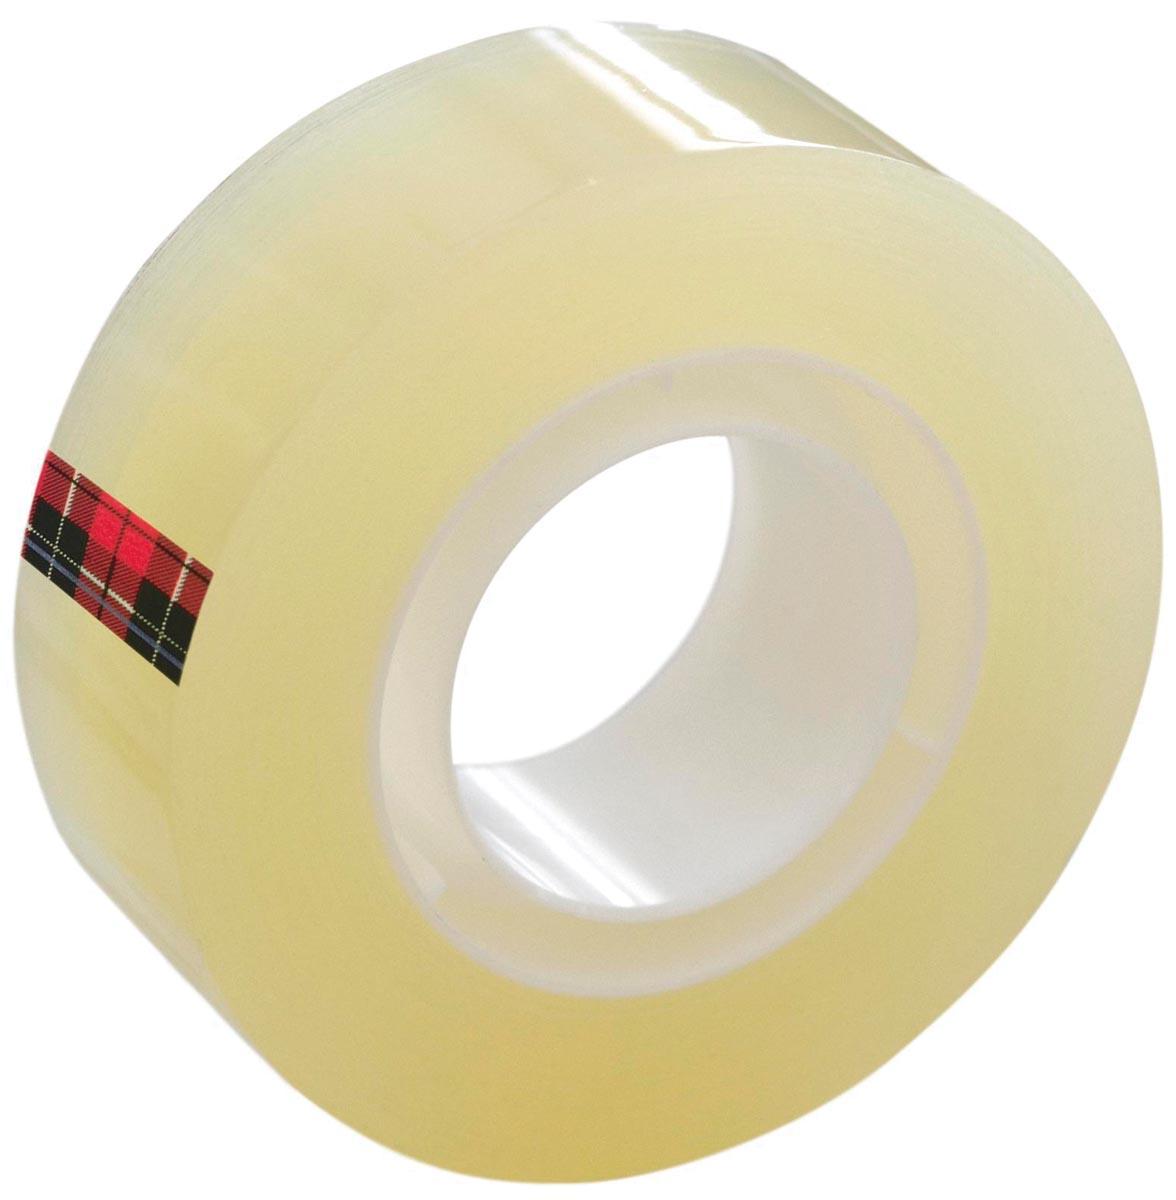 Scotch plakband Scotch 550 ft 19 mm x 33 m, 8 rolletjes